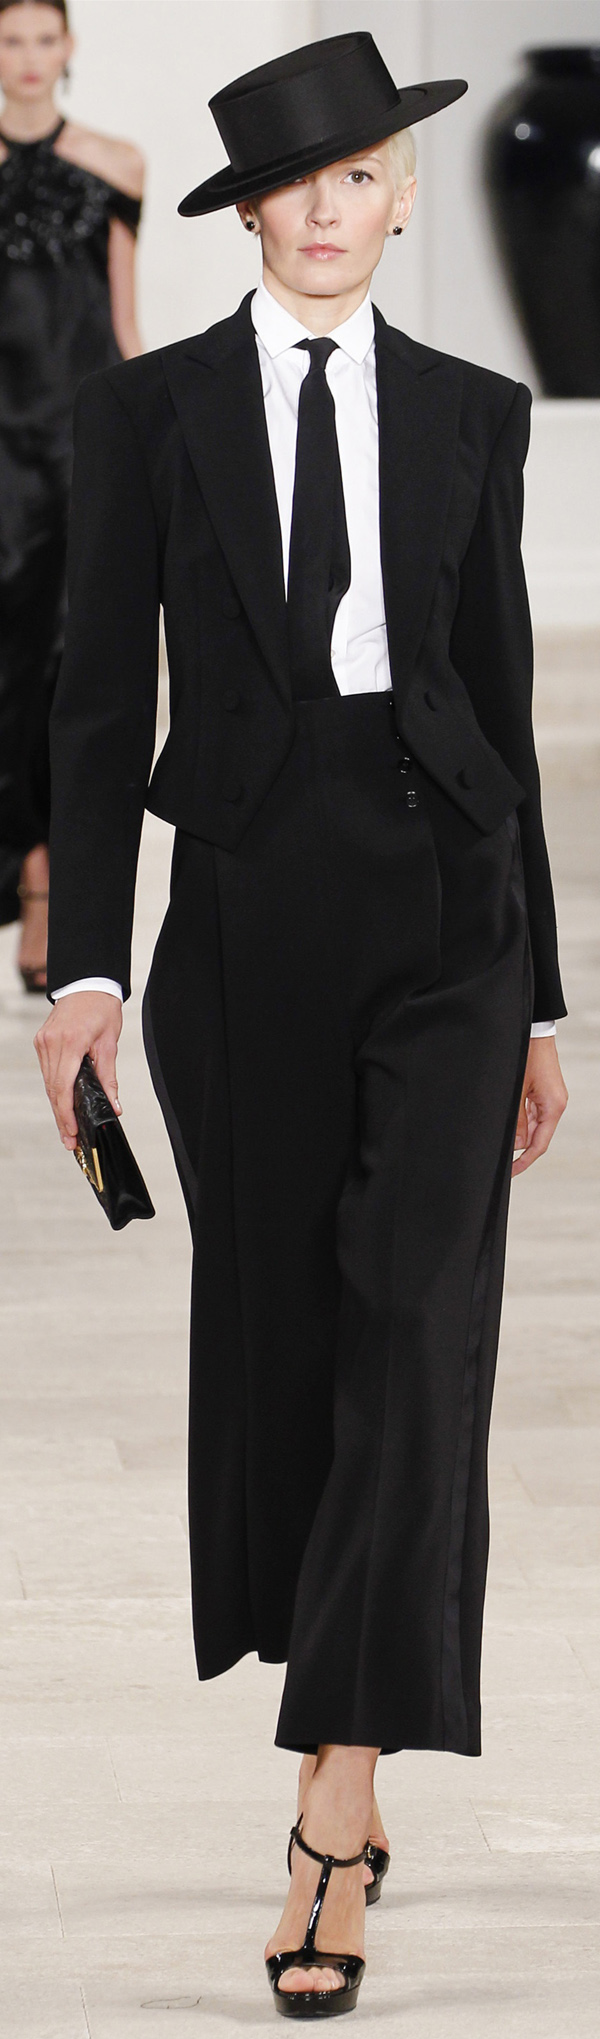 ✜ Ralph Lauren SS 2013 ✜ http://www.vogue.com/collections/spring-2013-rtw/ralph-lauren/review/# MORE on Runway & on Dresses